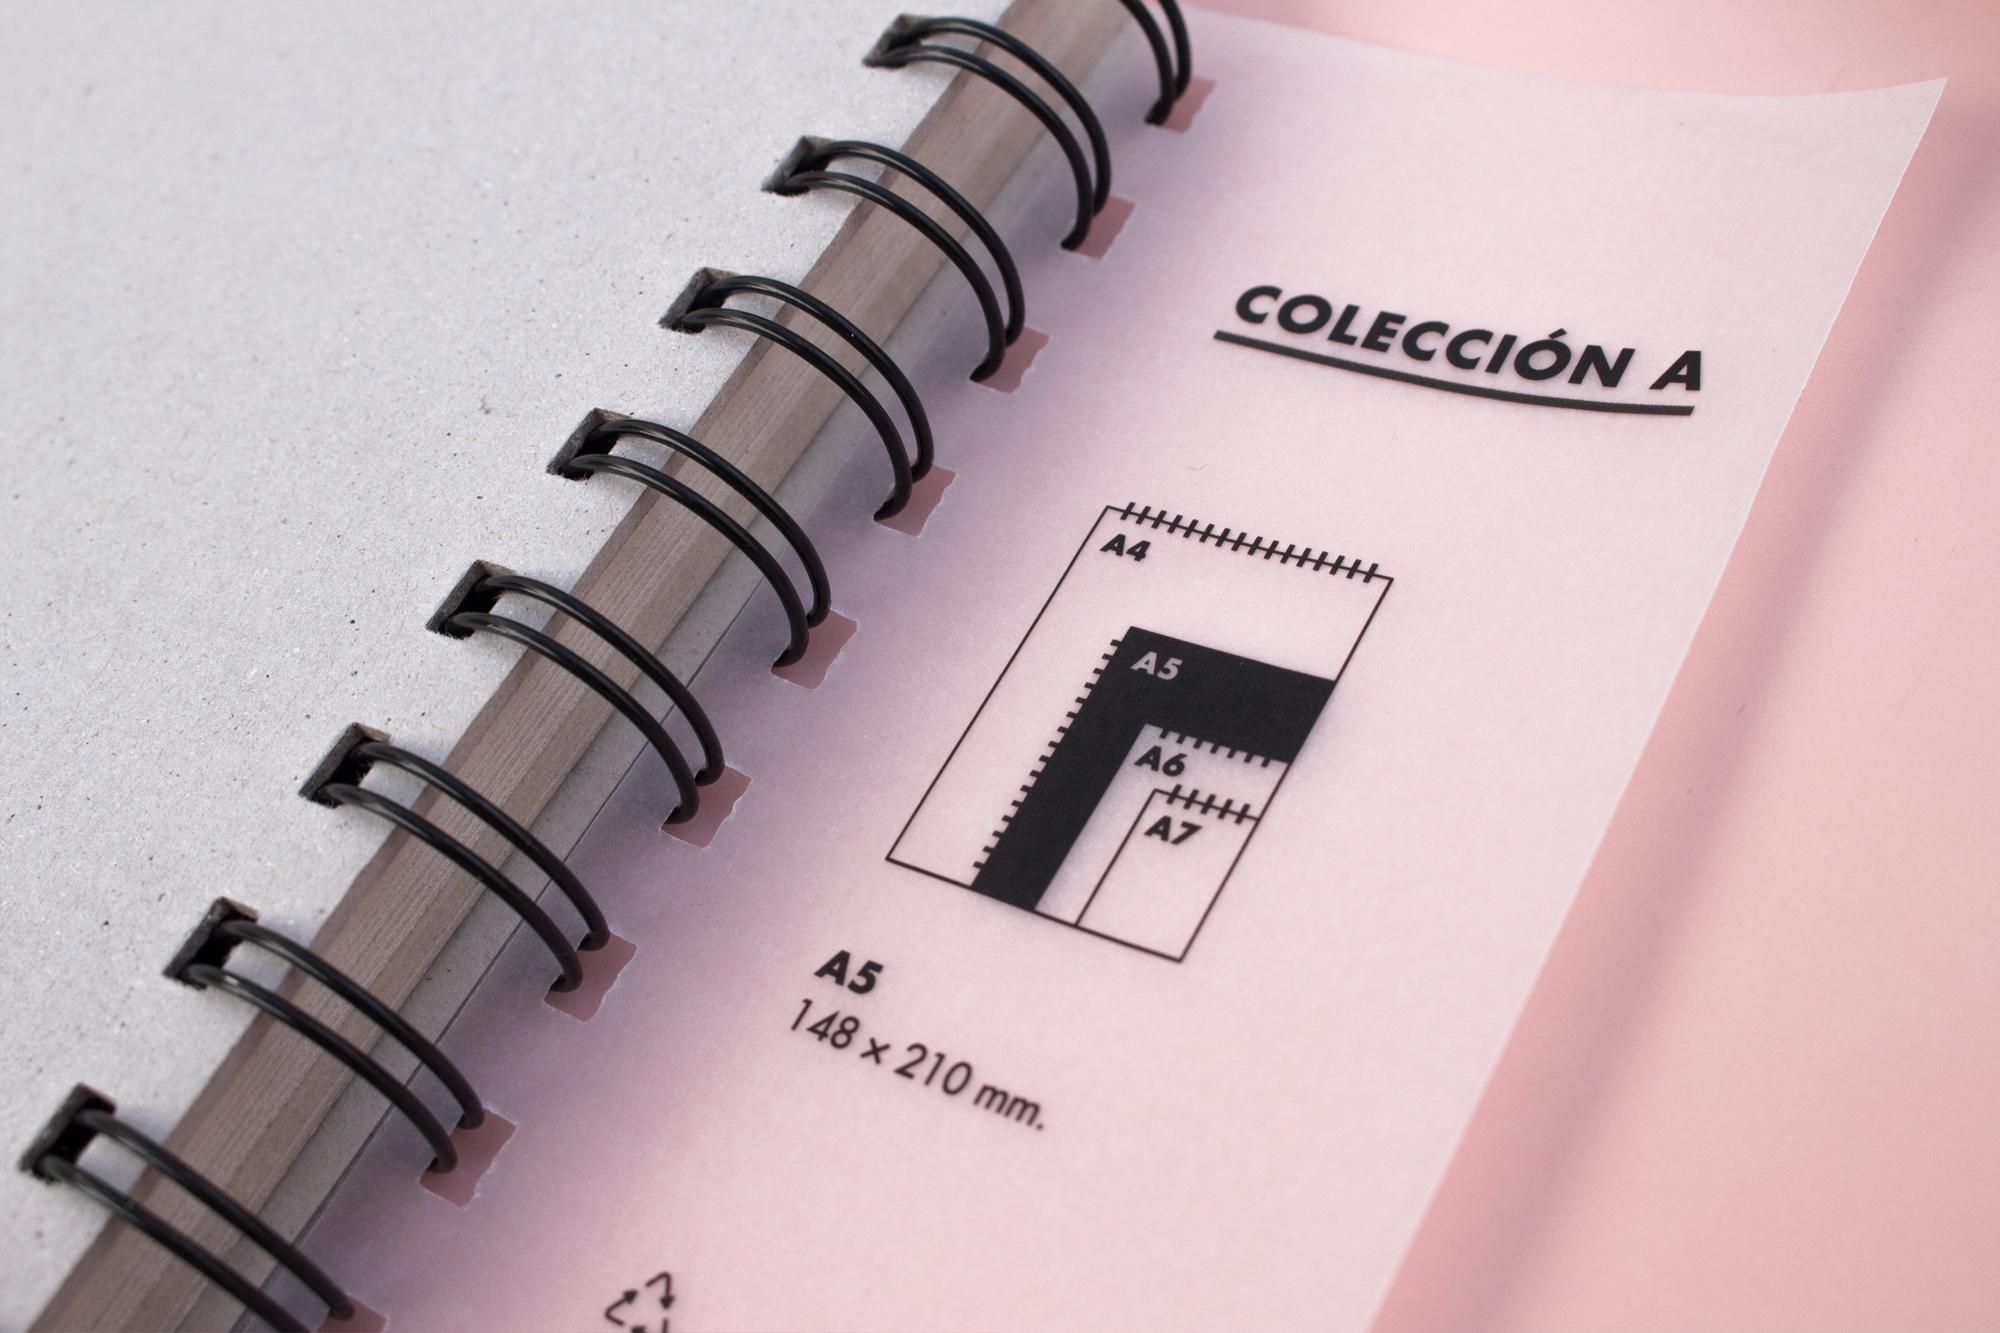 home-generica-coleccion-A-papel-principal-letterpress-imprenta-tipografica-artesanal.jpg